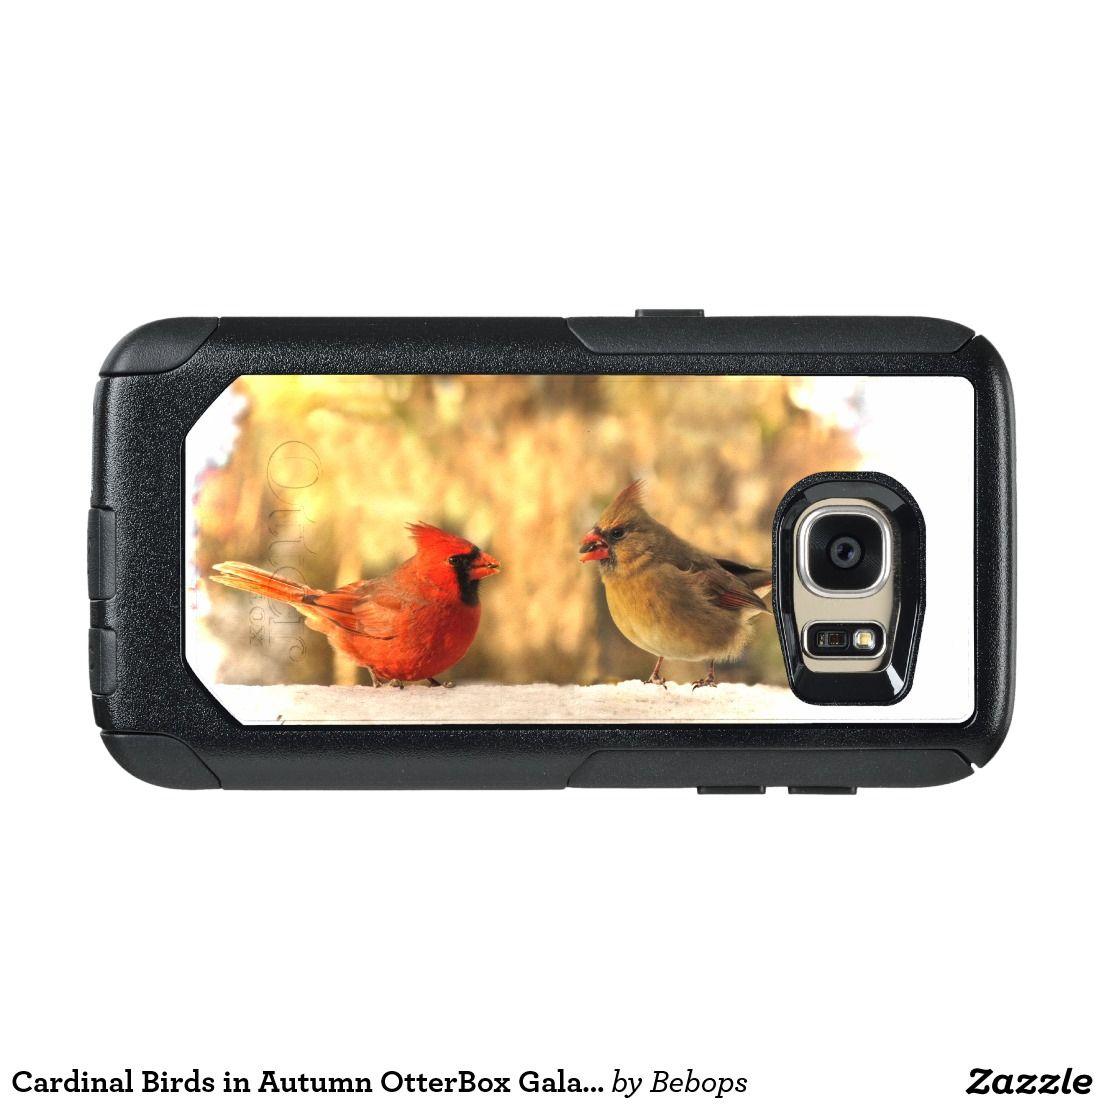 Cardinal Birds in Autumn OtterBox Galaxy S7 Case